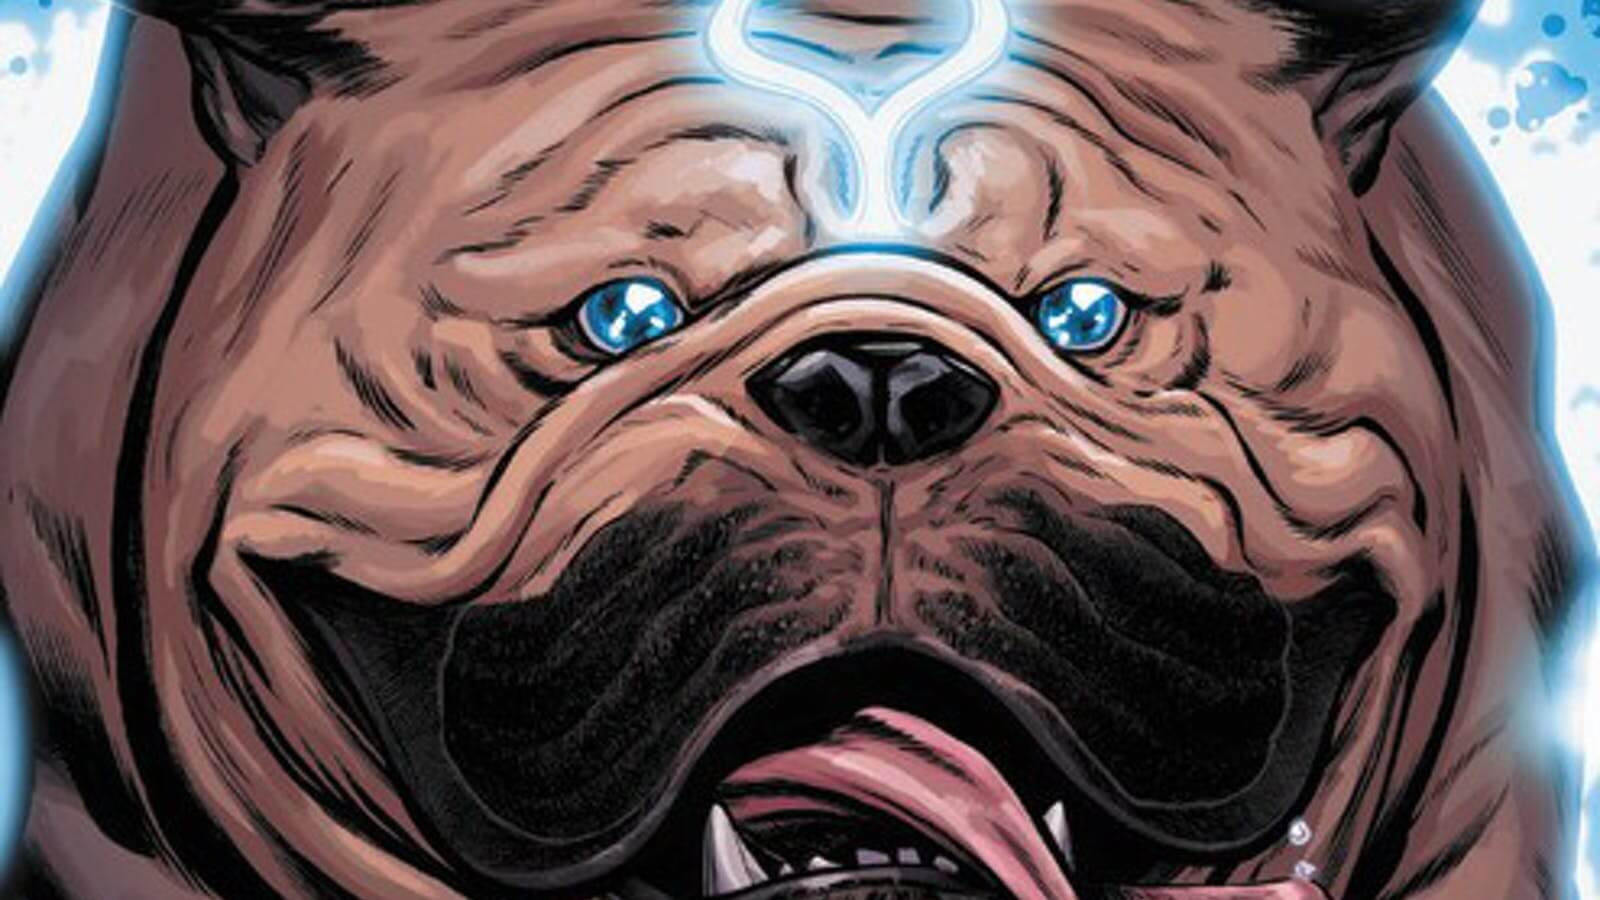 a giant bulldog runs forward, tongue lolling